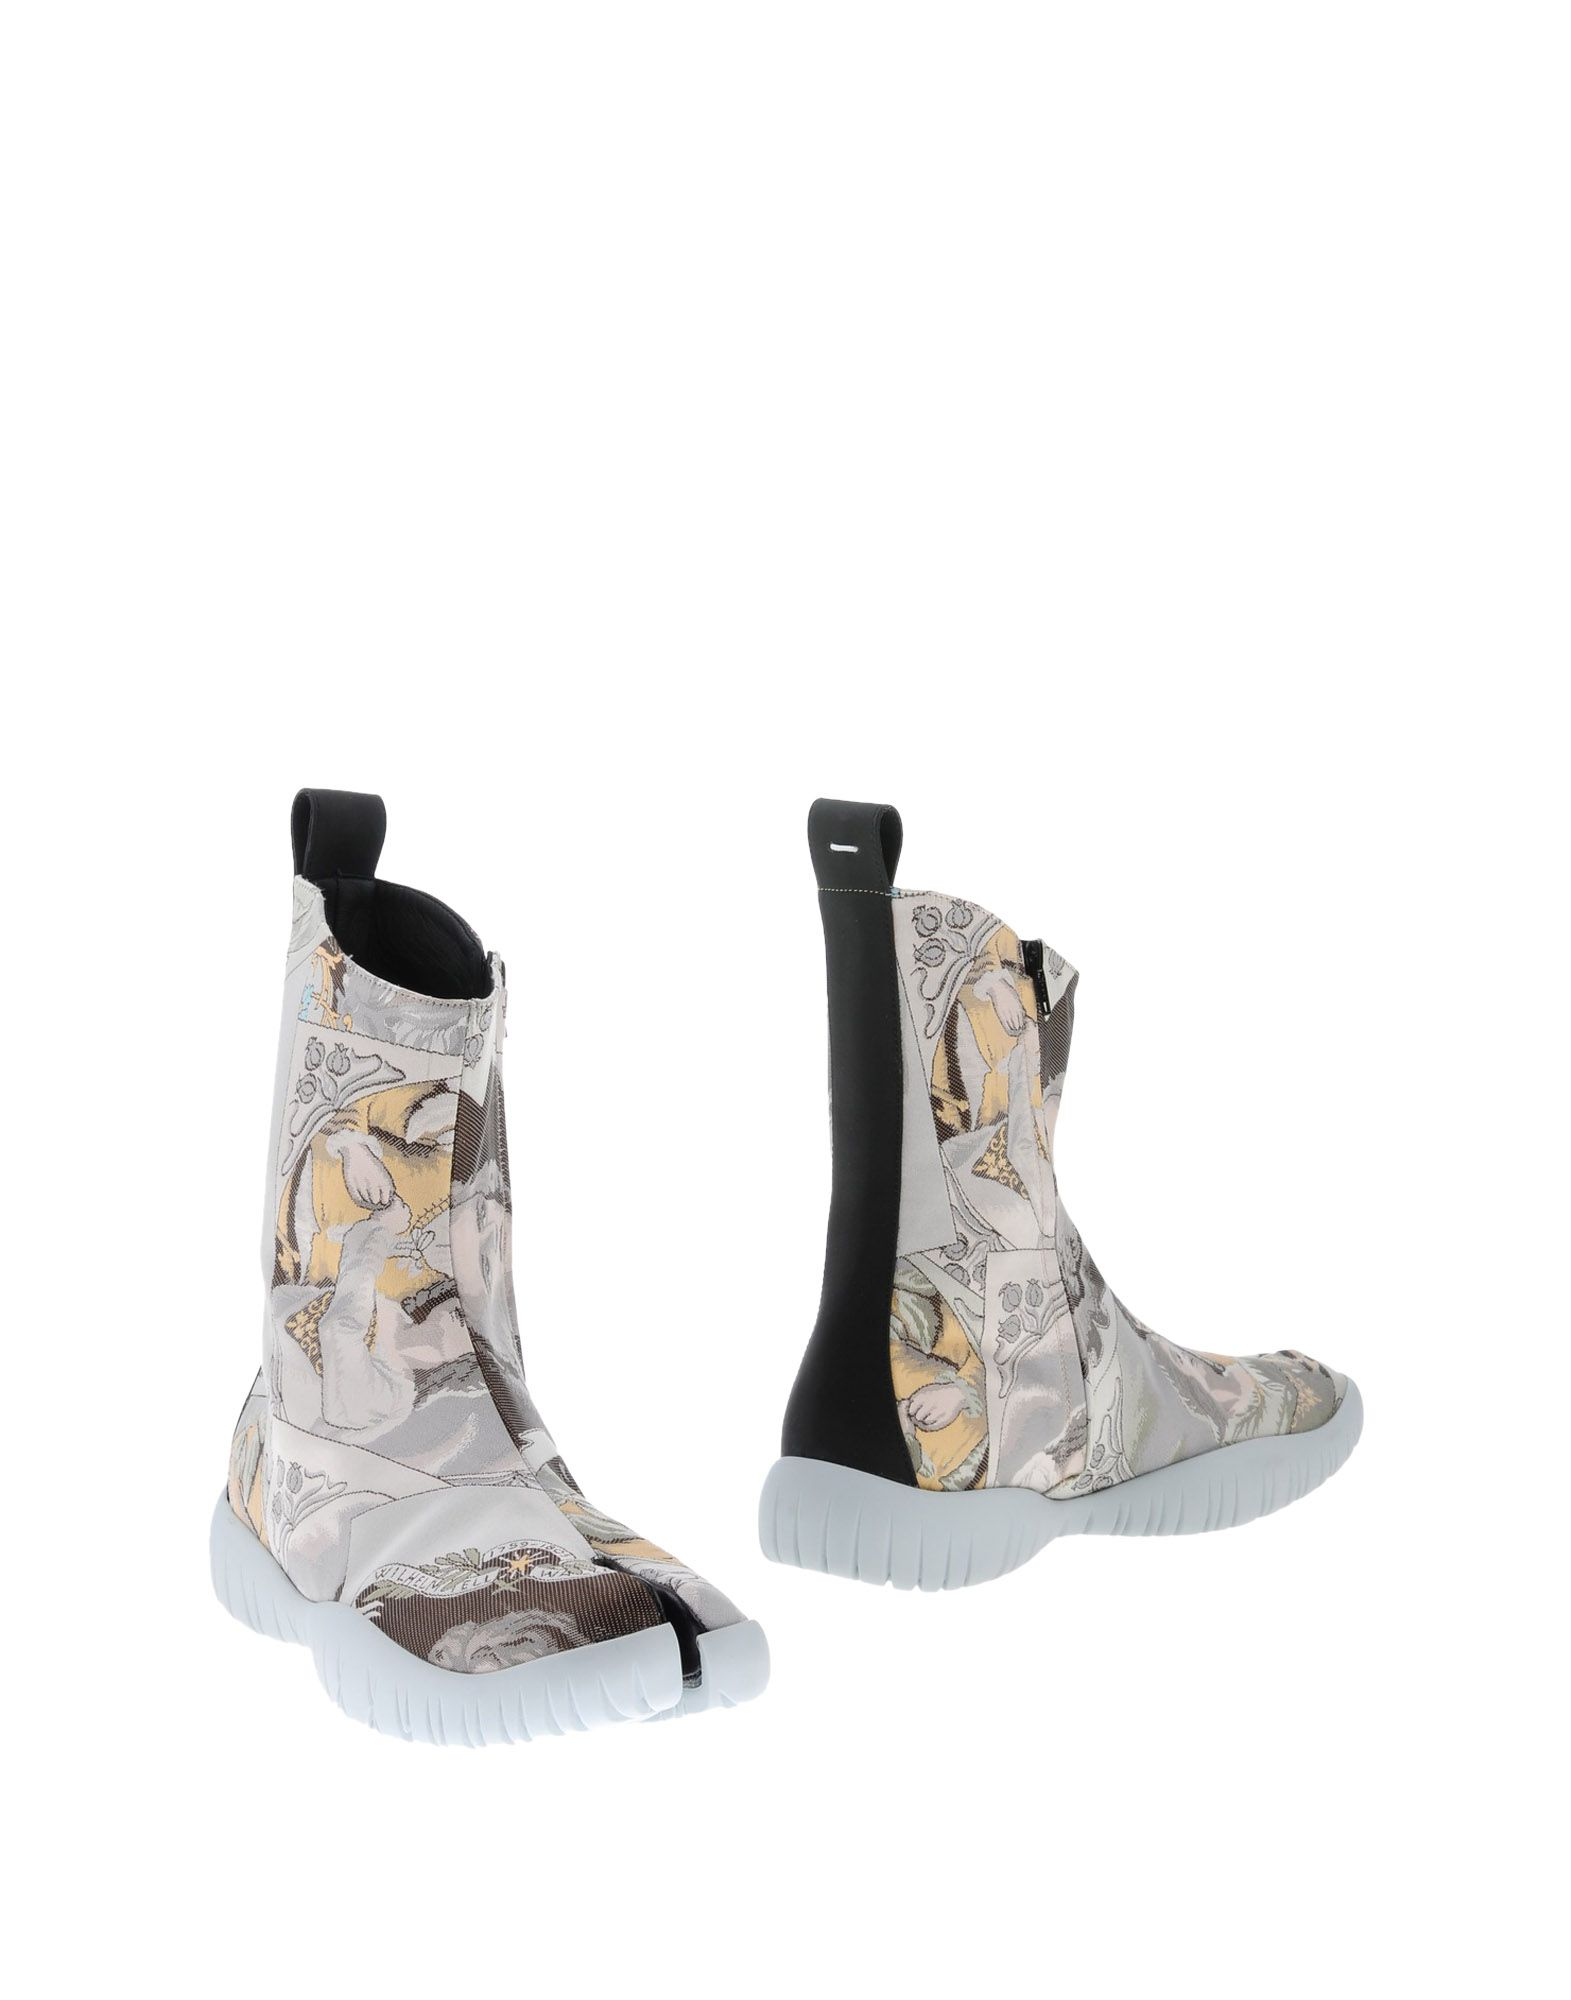 Maison Margiela Stiefelette Stiefelette Margiela Damen  11351287WV Neue Schuhe 509d96